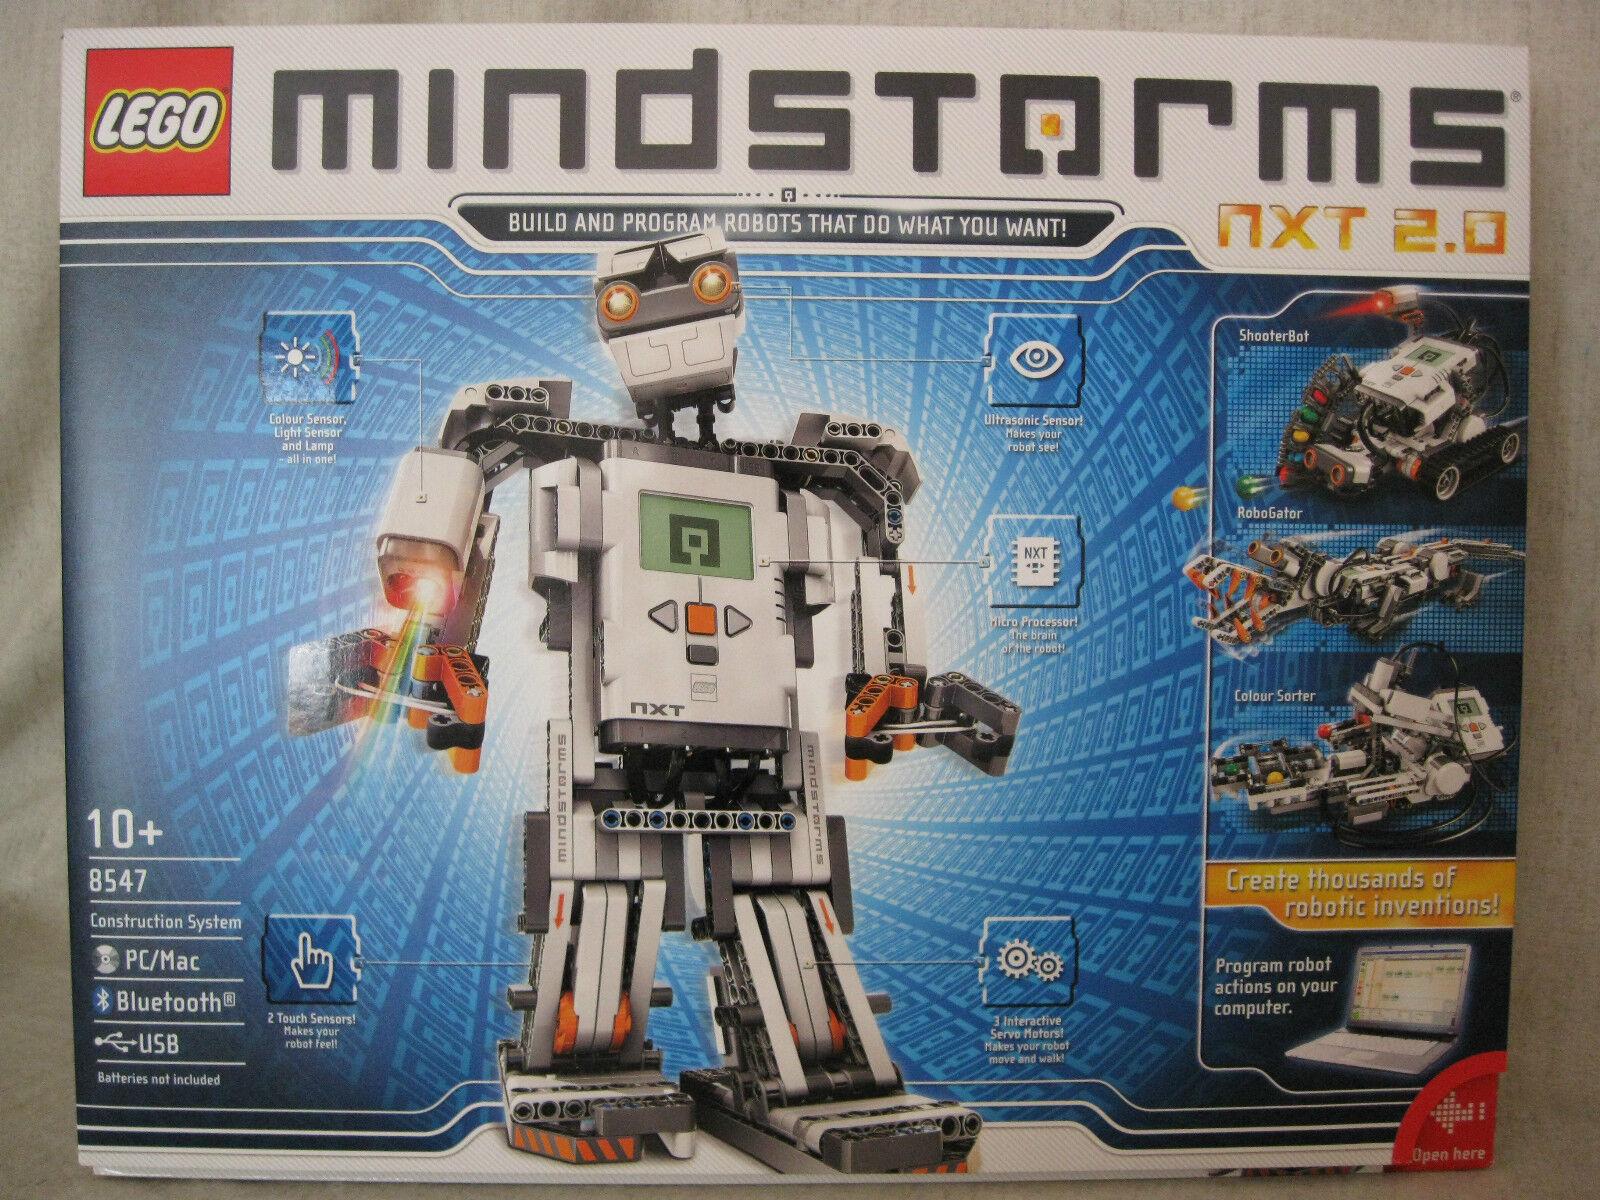 B N Lego 8547 Mindstorms NXT 2.0. Still Sealed. Discontinued Set. UK Version.